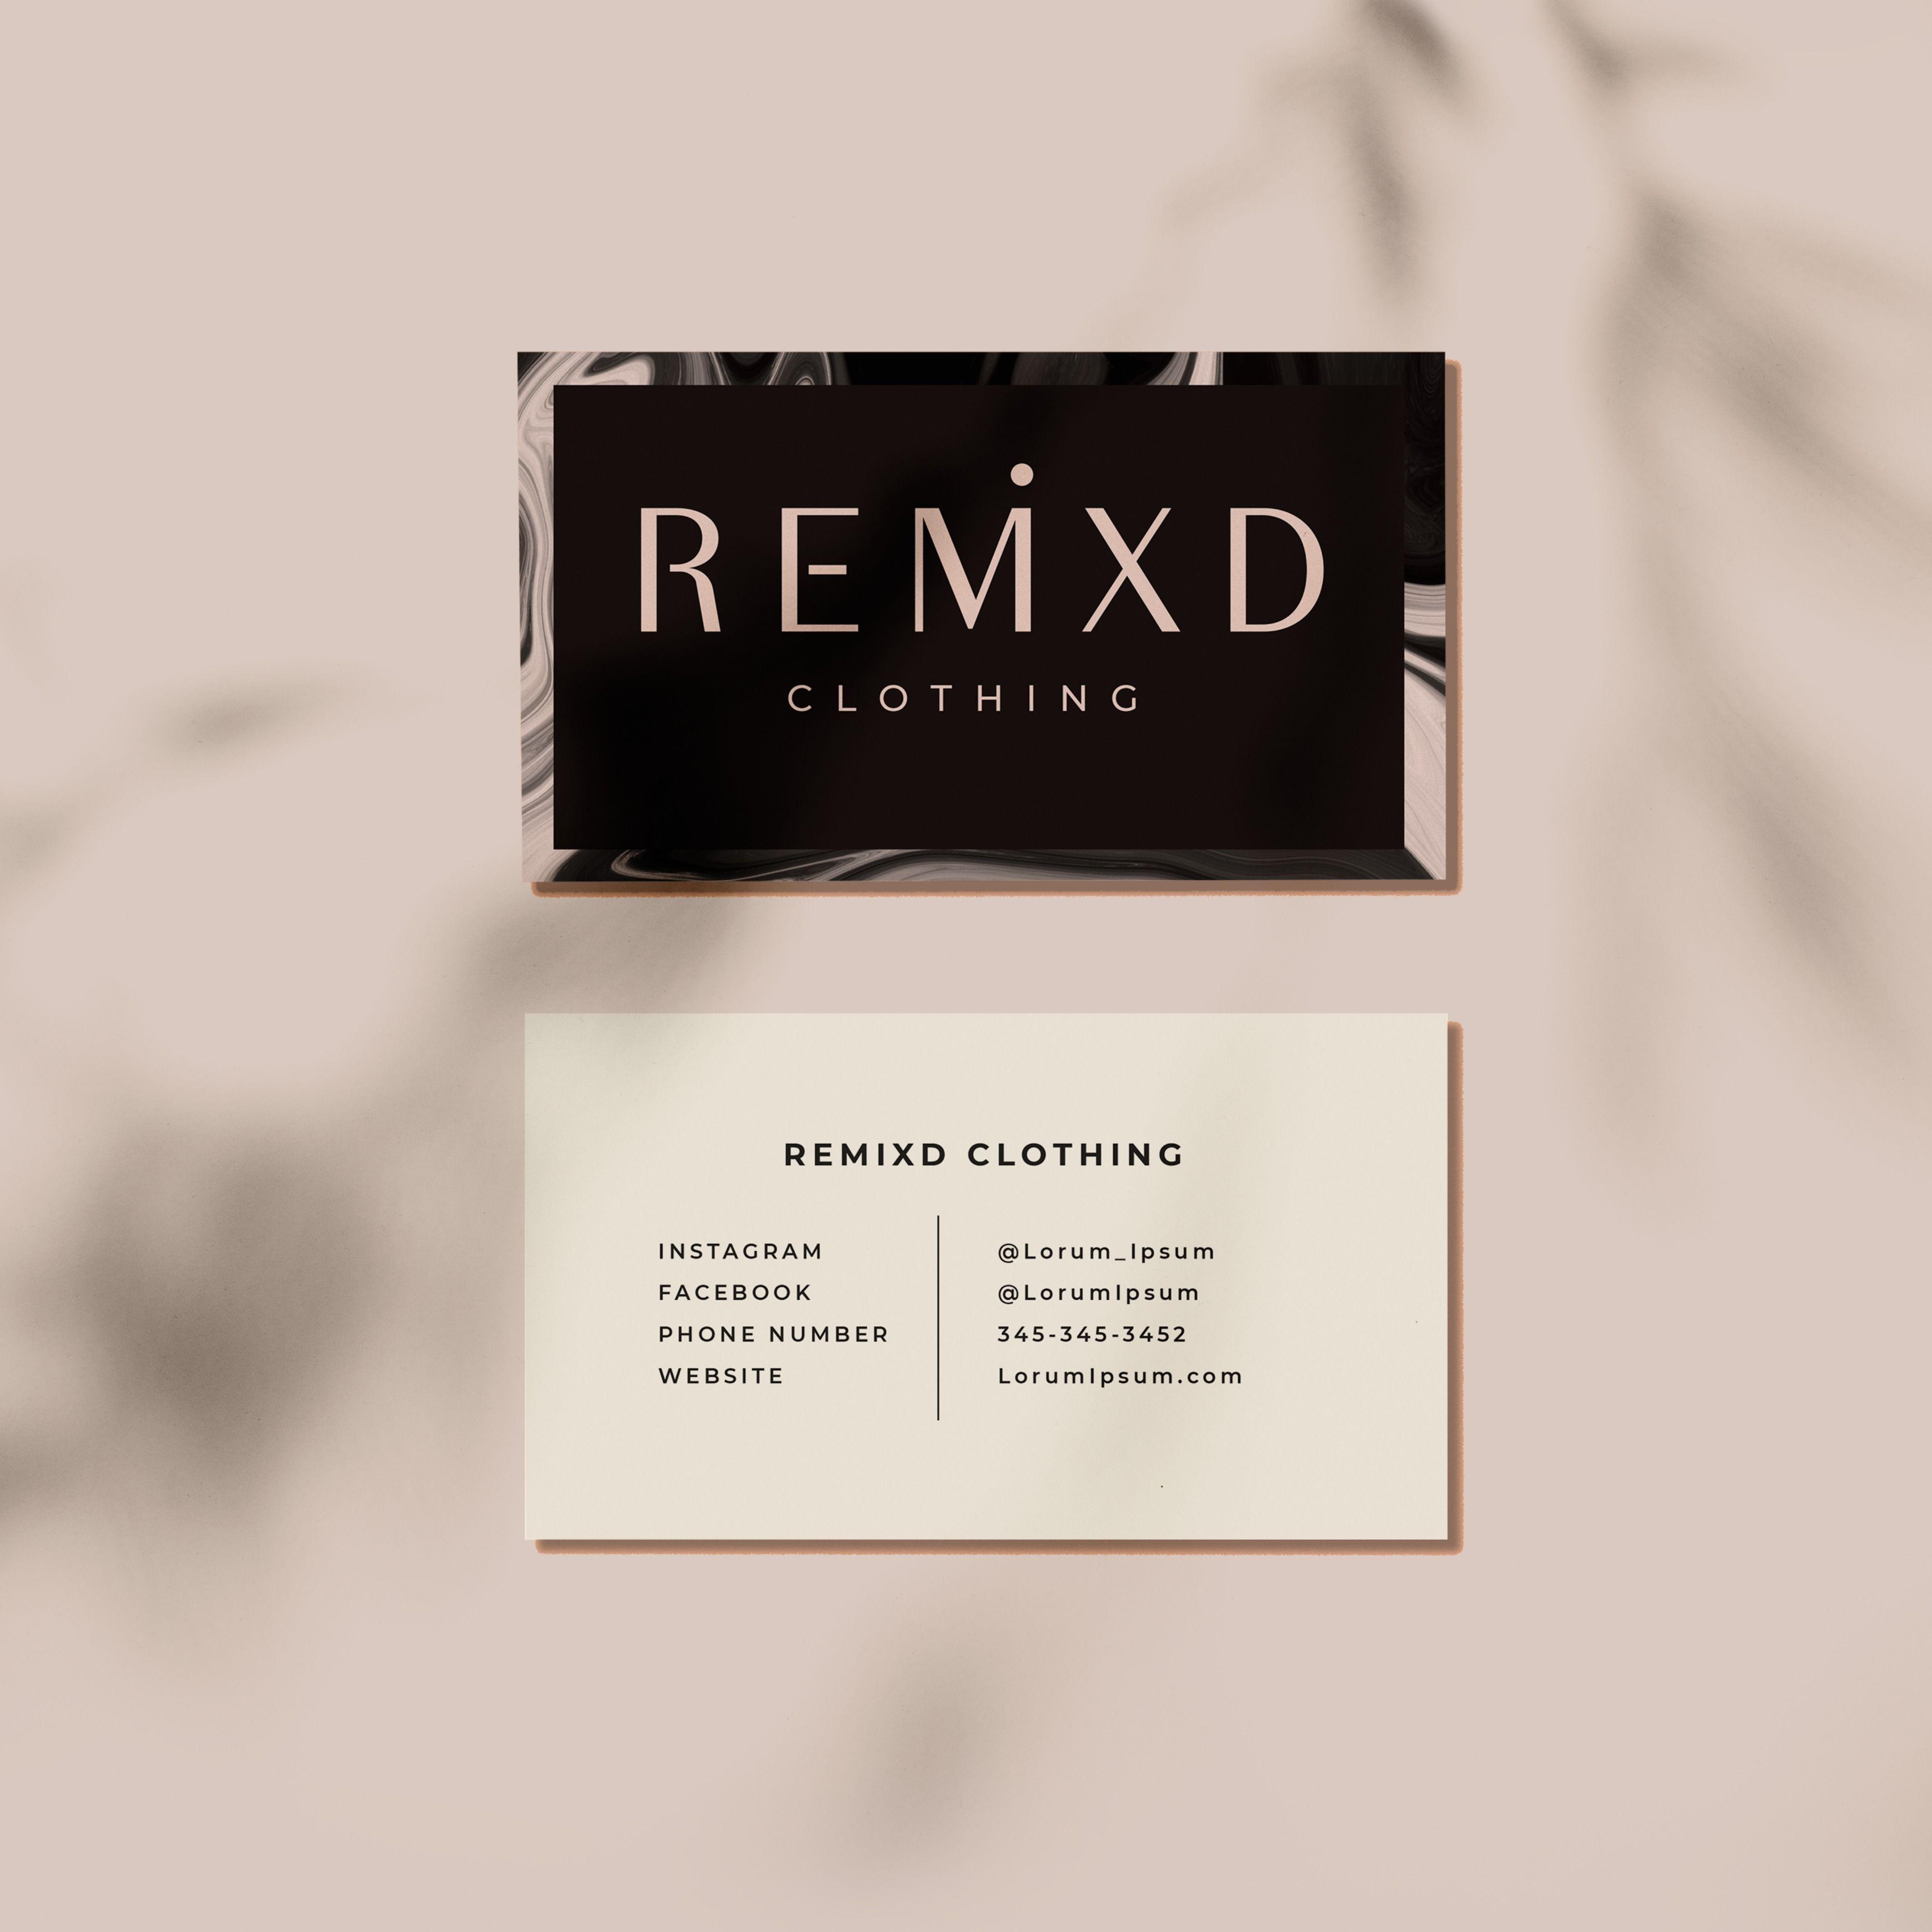 Business Card Design Fashion Brand Business Card Design Business Card Design Fashion Business Card Inspiration